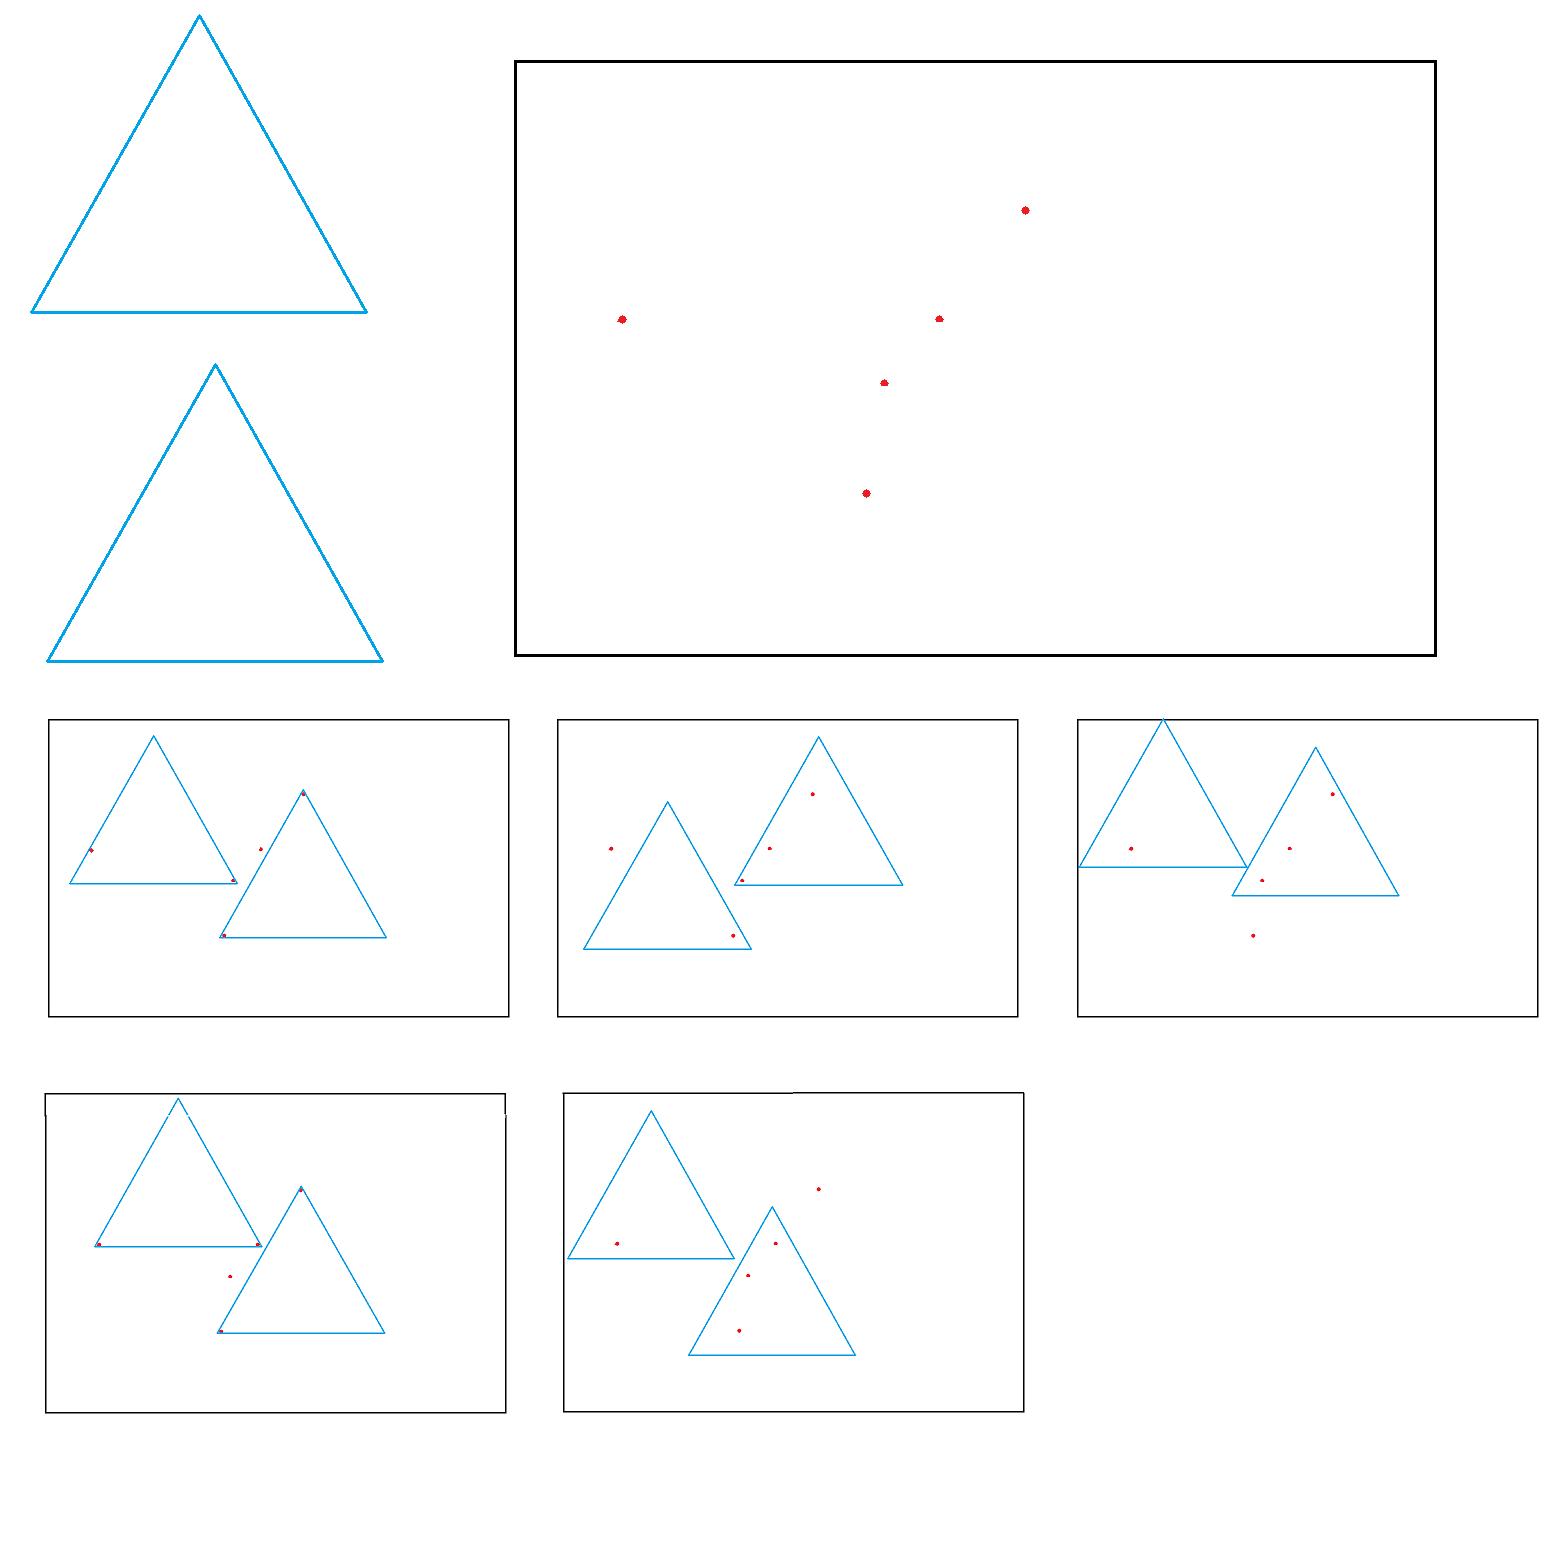 http://www.prise2tete.fr/upload/gwen27-tache5.png